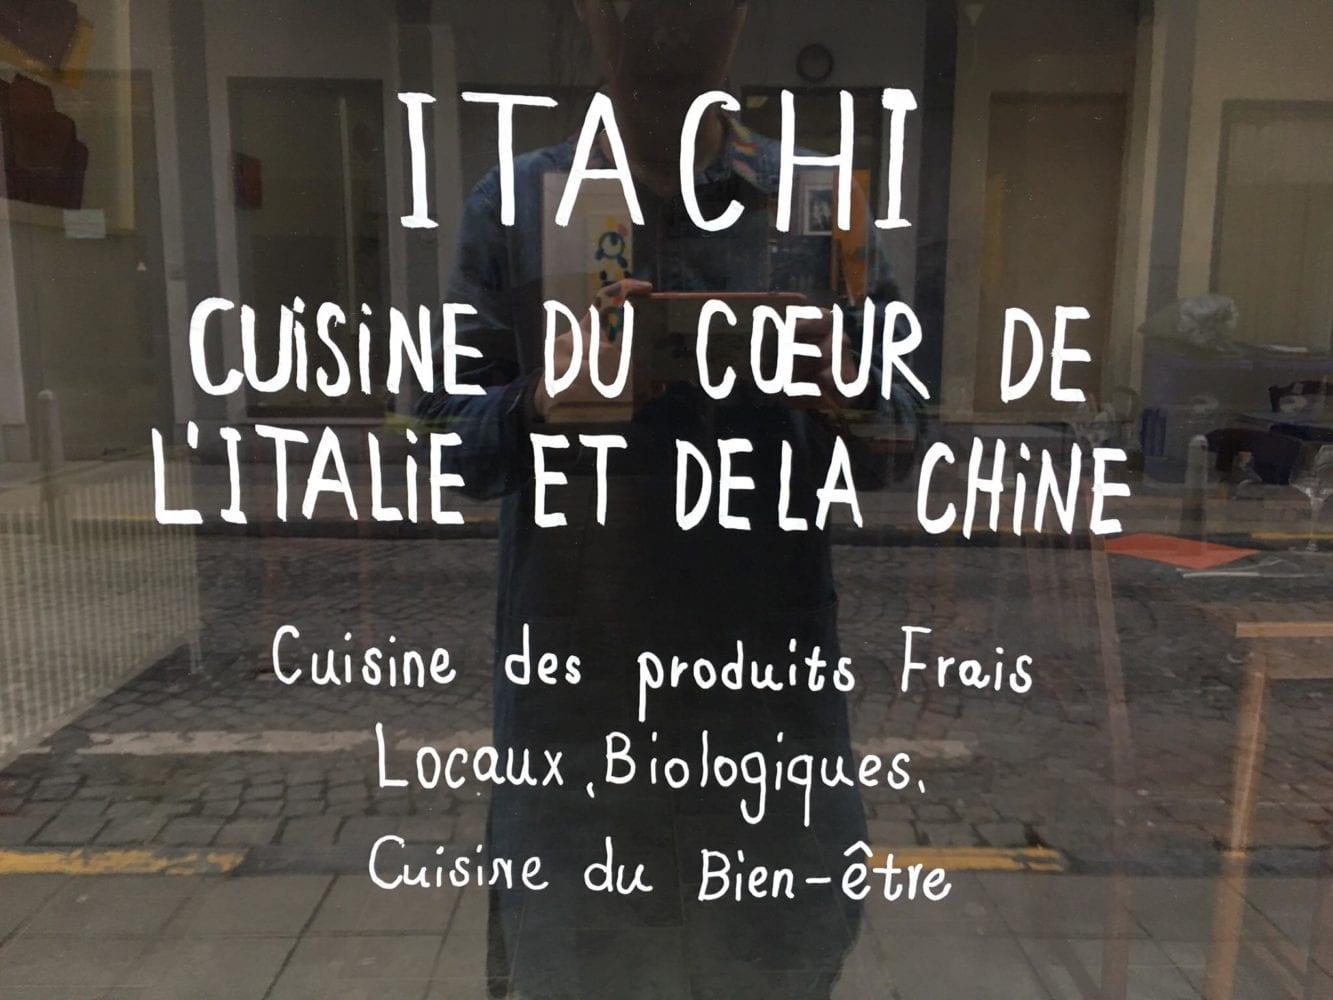 Itachi Liège